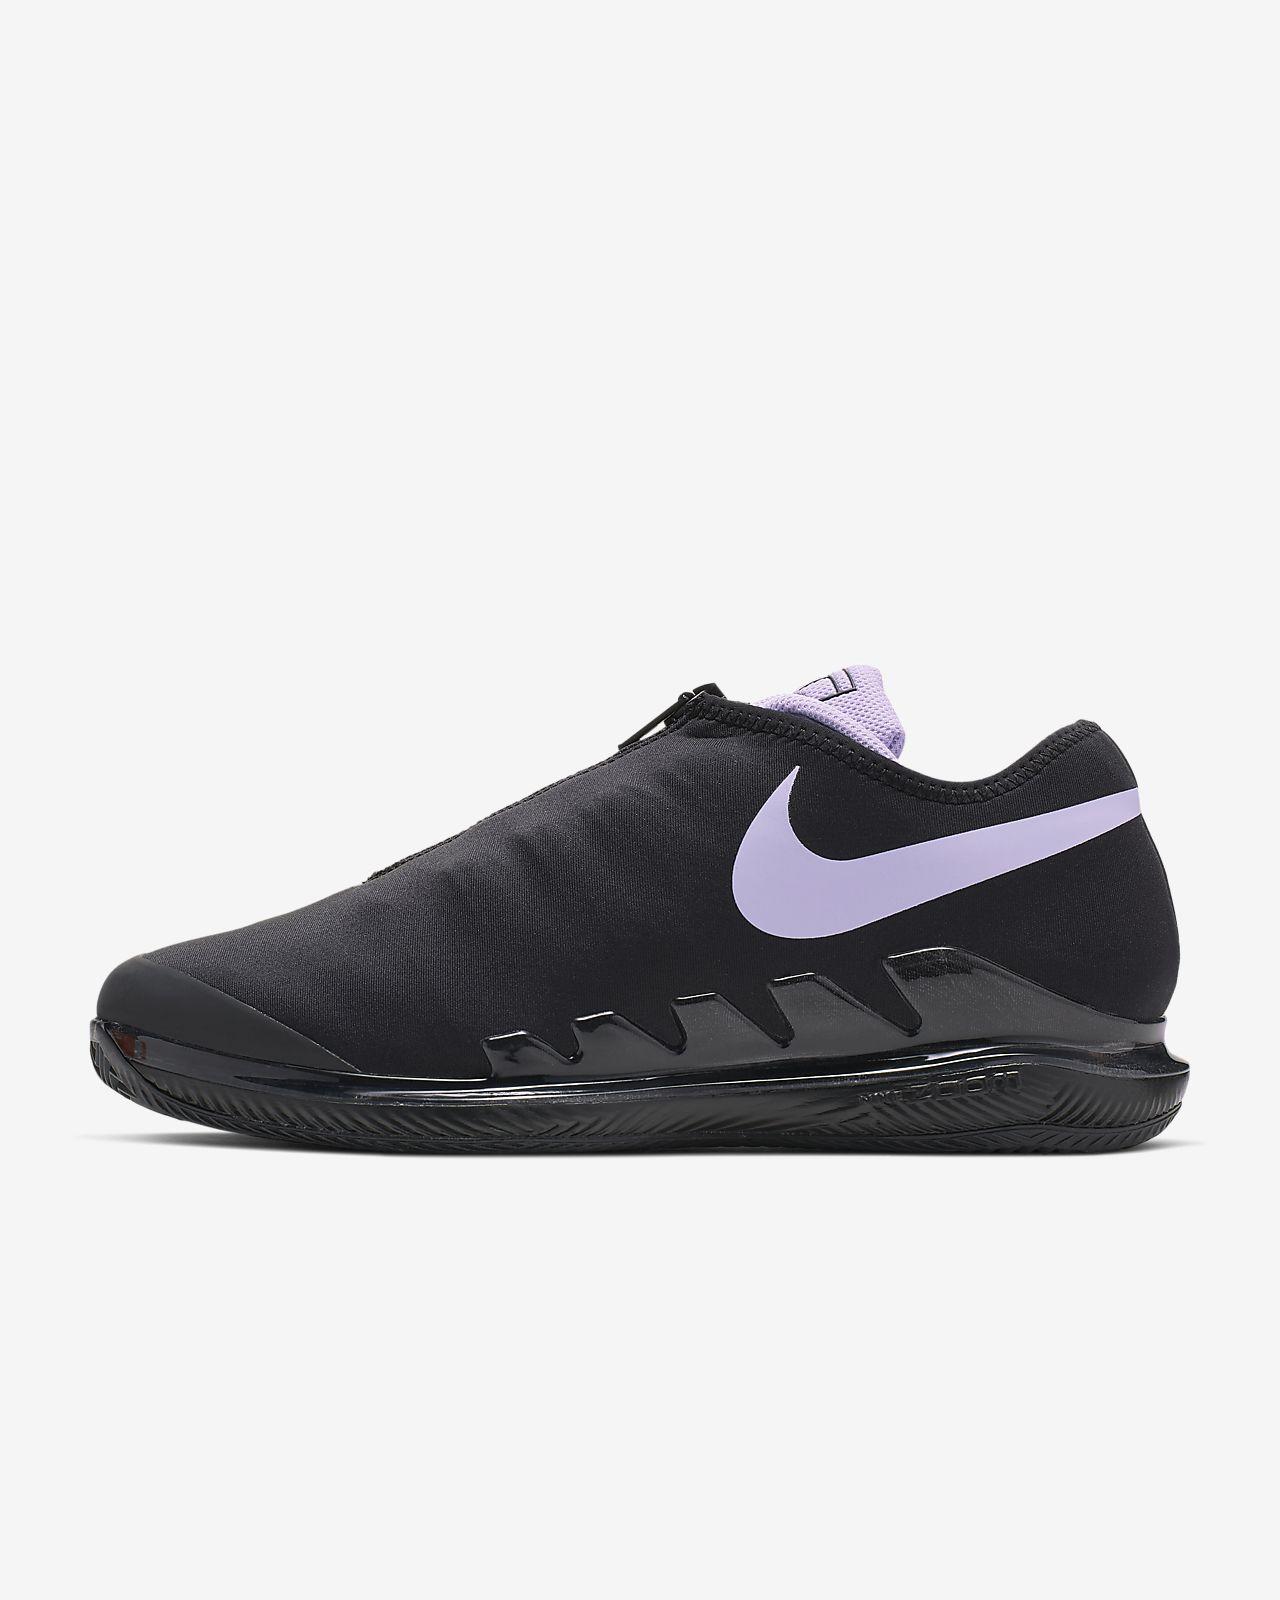 NikeCourt Air Zoom Vapor X Glove Women's Clay Tennis Shoe